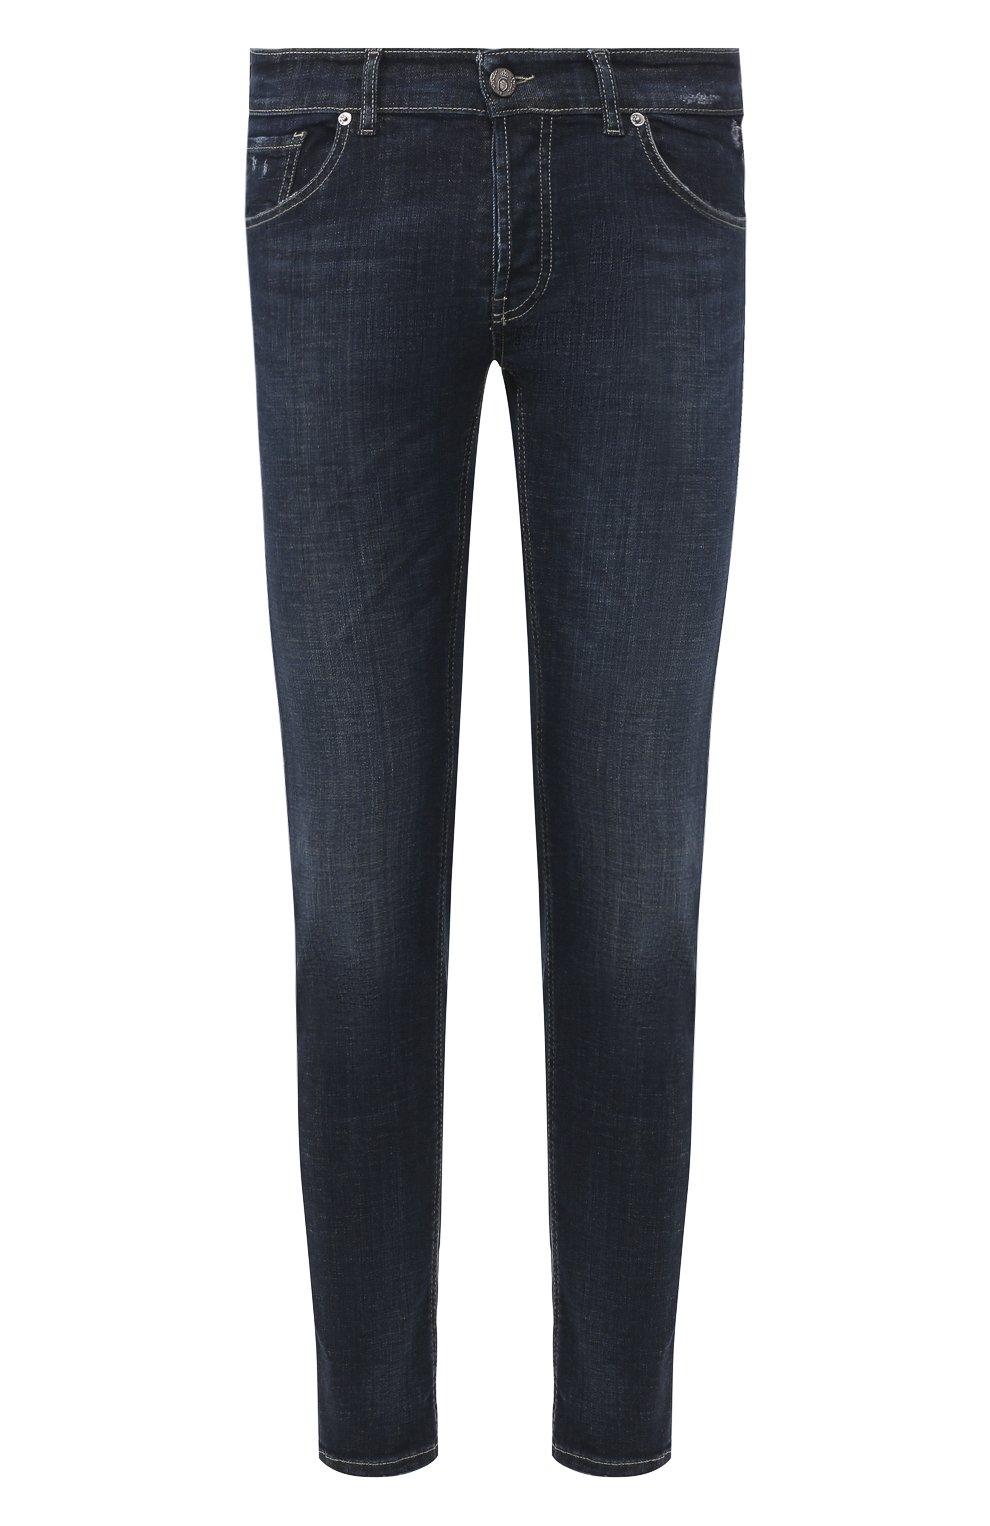 Мужские джинсы PREMIUM MOOD DENIM SUPERIOR темно-синего цвета, арт. S20 0310340011/PAUL | Фото 1